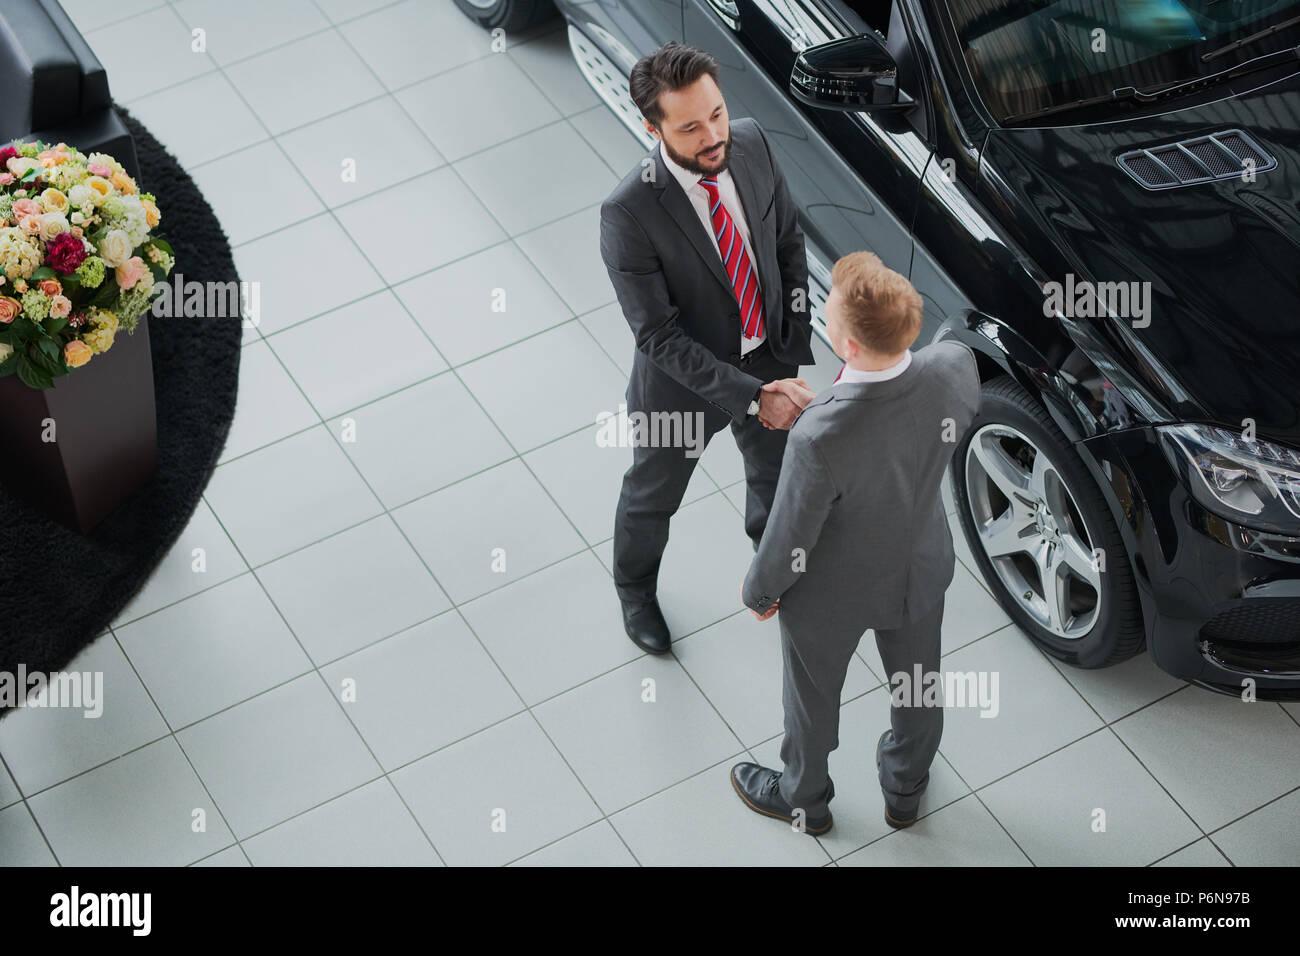 auto purchase agreement stock photos auto purchase agreement stock